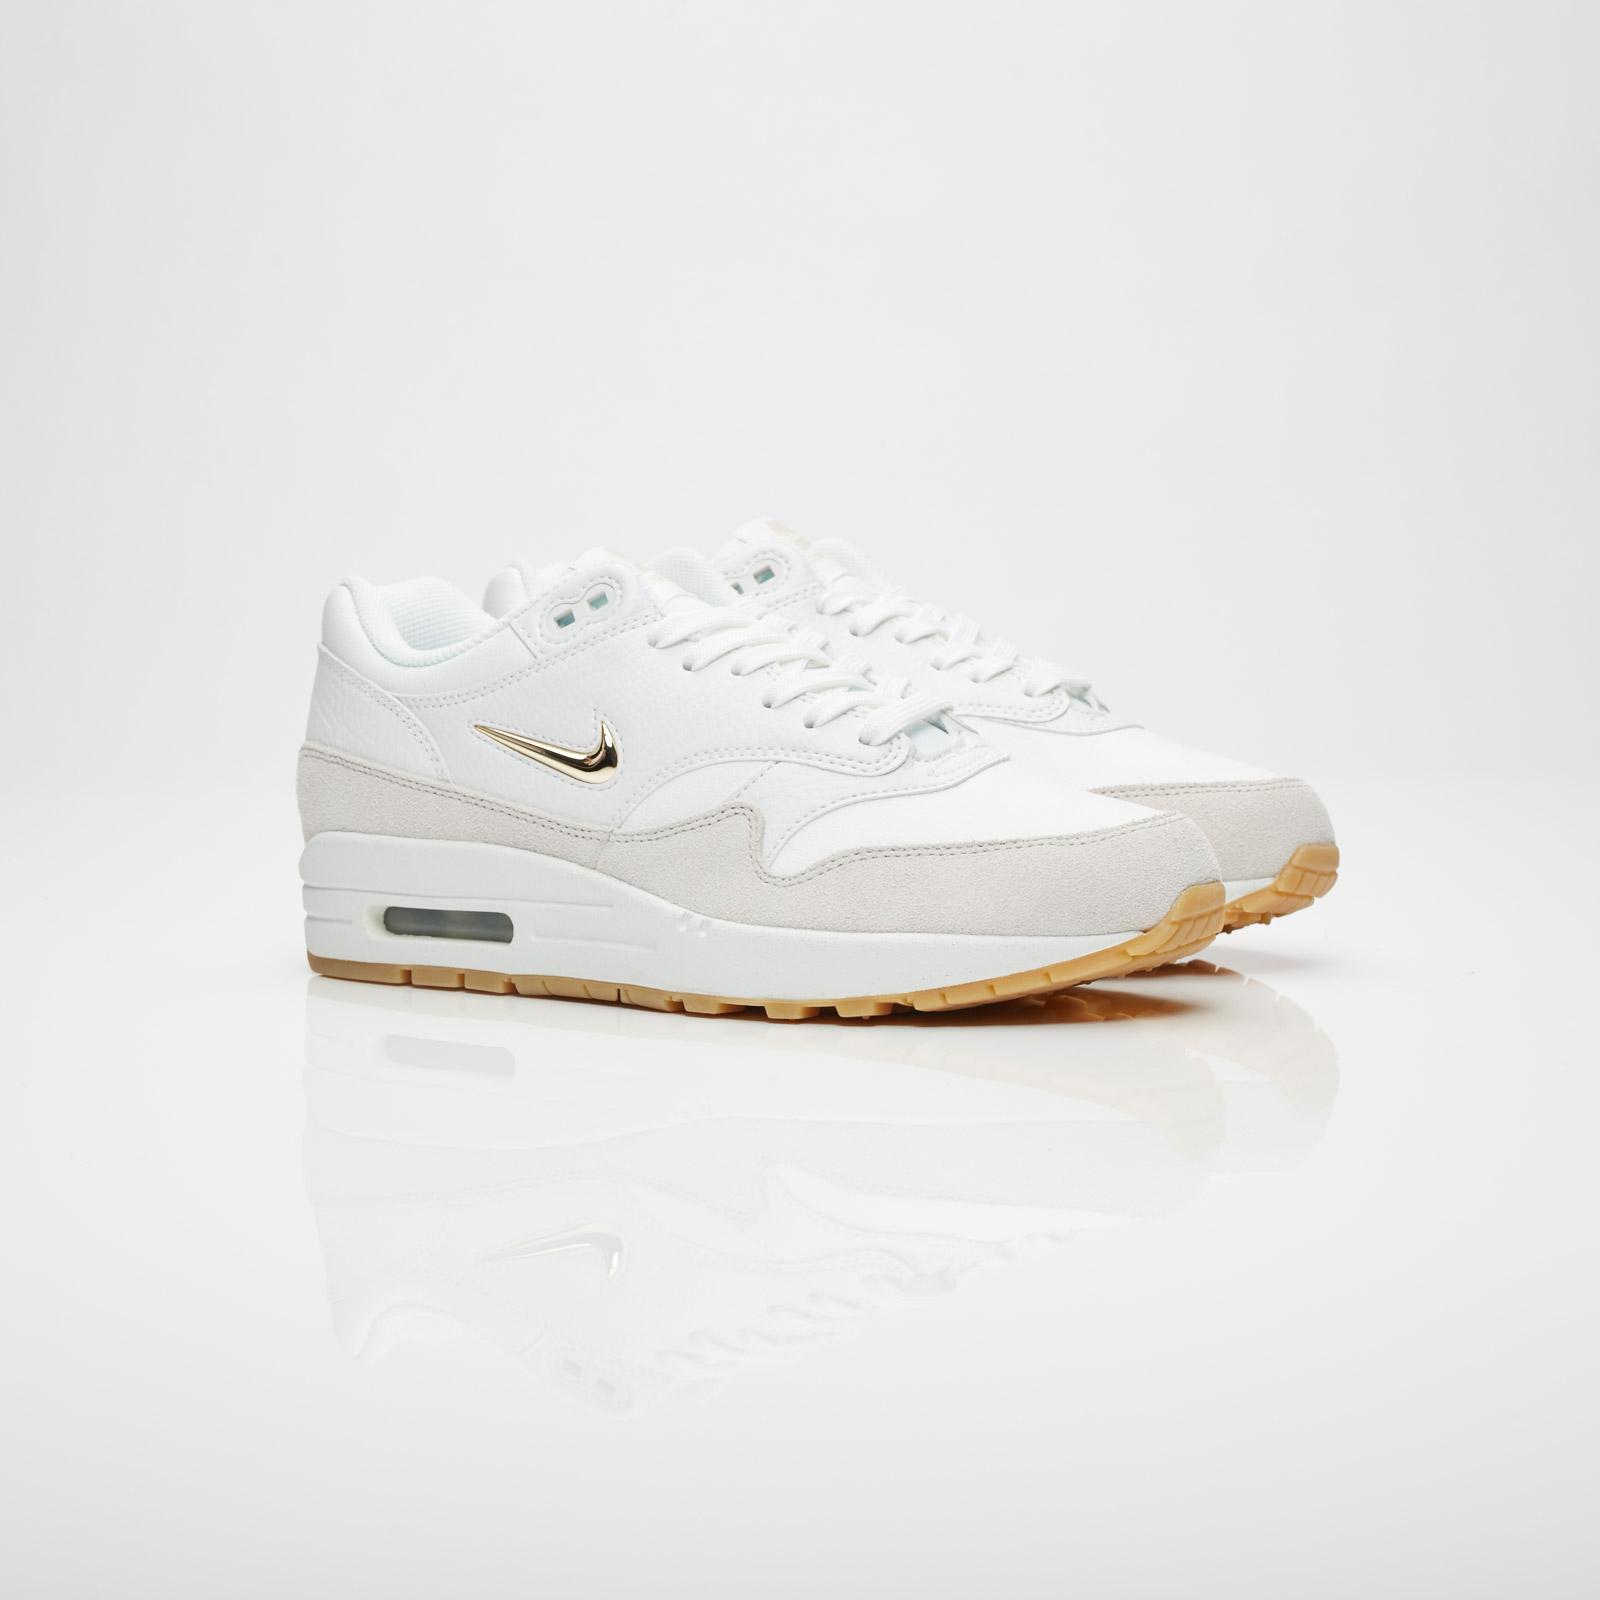 size 40 437c3 8f8cd Nike Sportswear Wmns Air Max 1 Premium SC